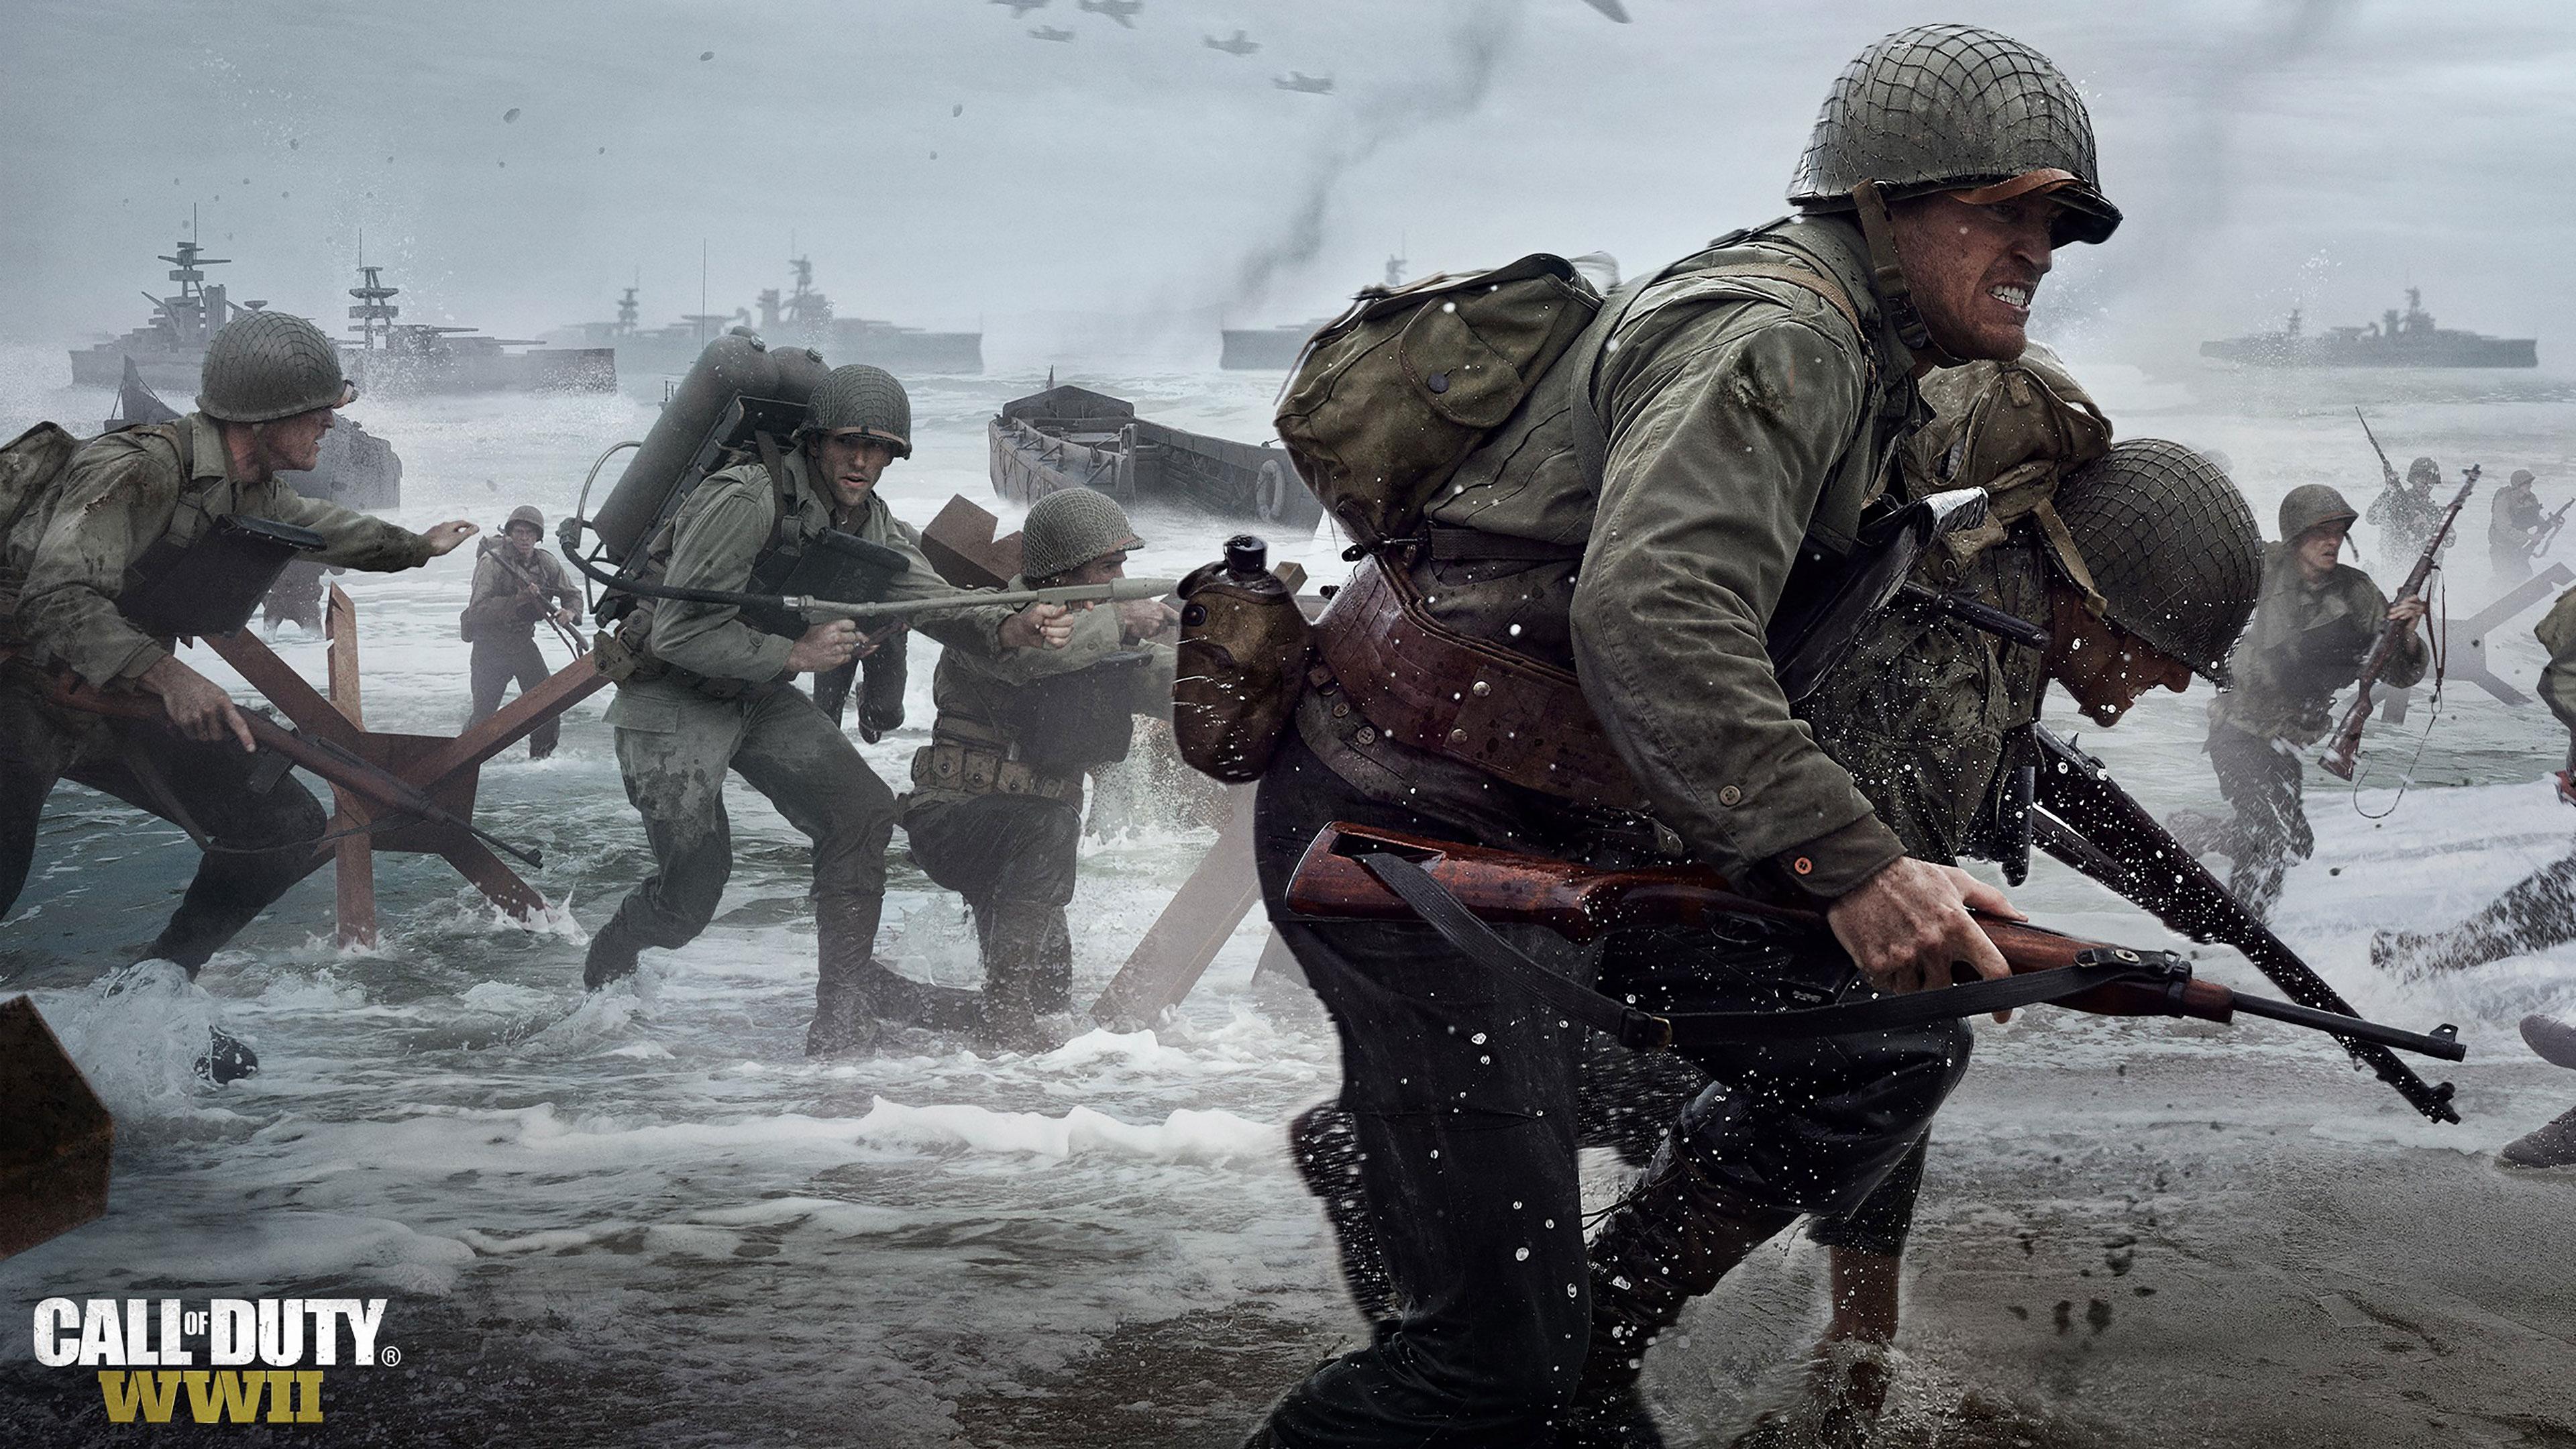 CALL OF DUTY WWII Wallpapers In Ultra HD 4K Gameranx